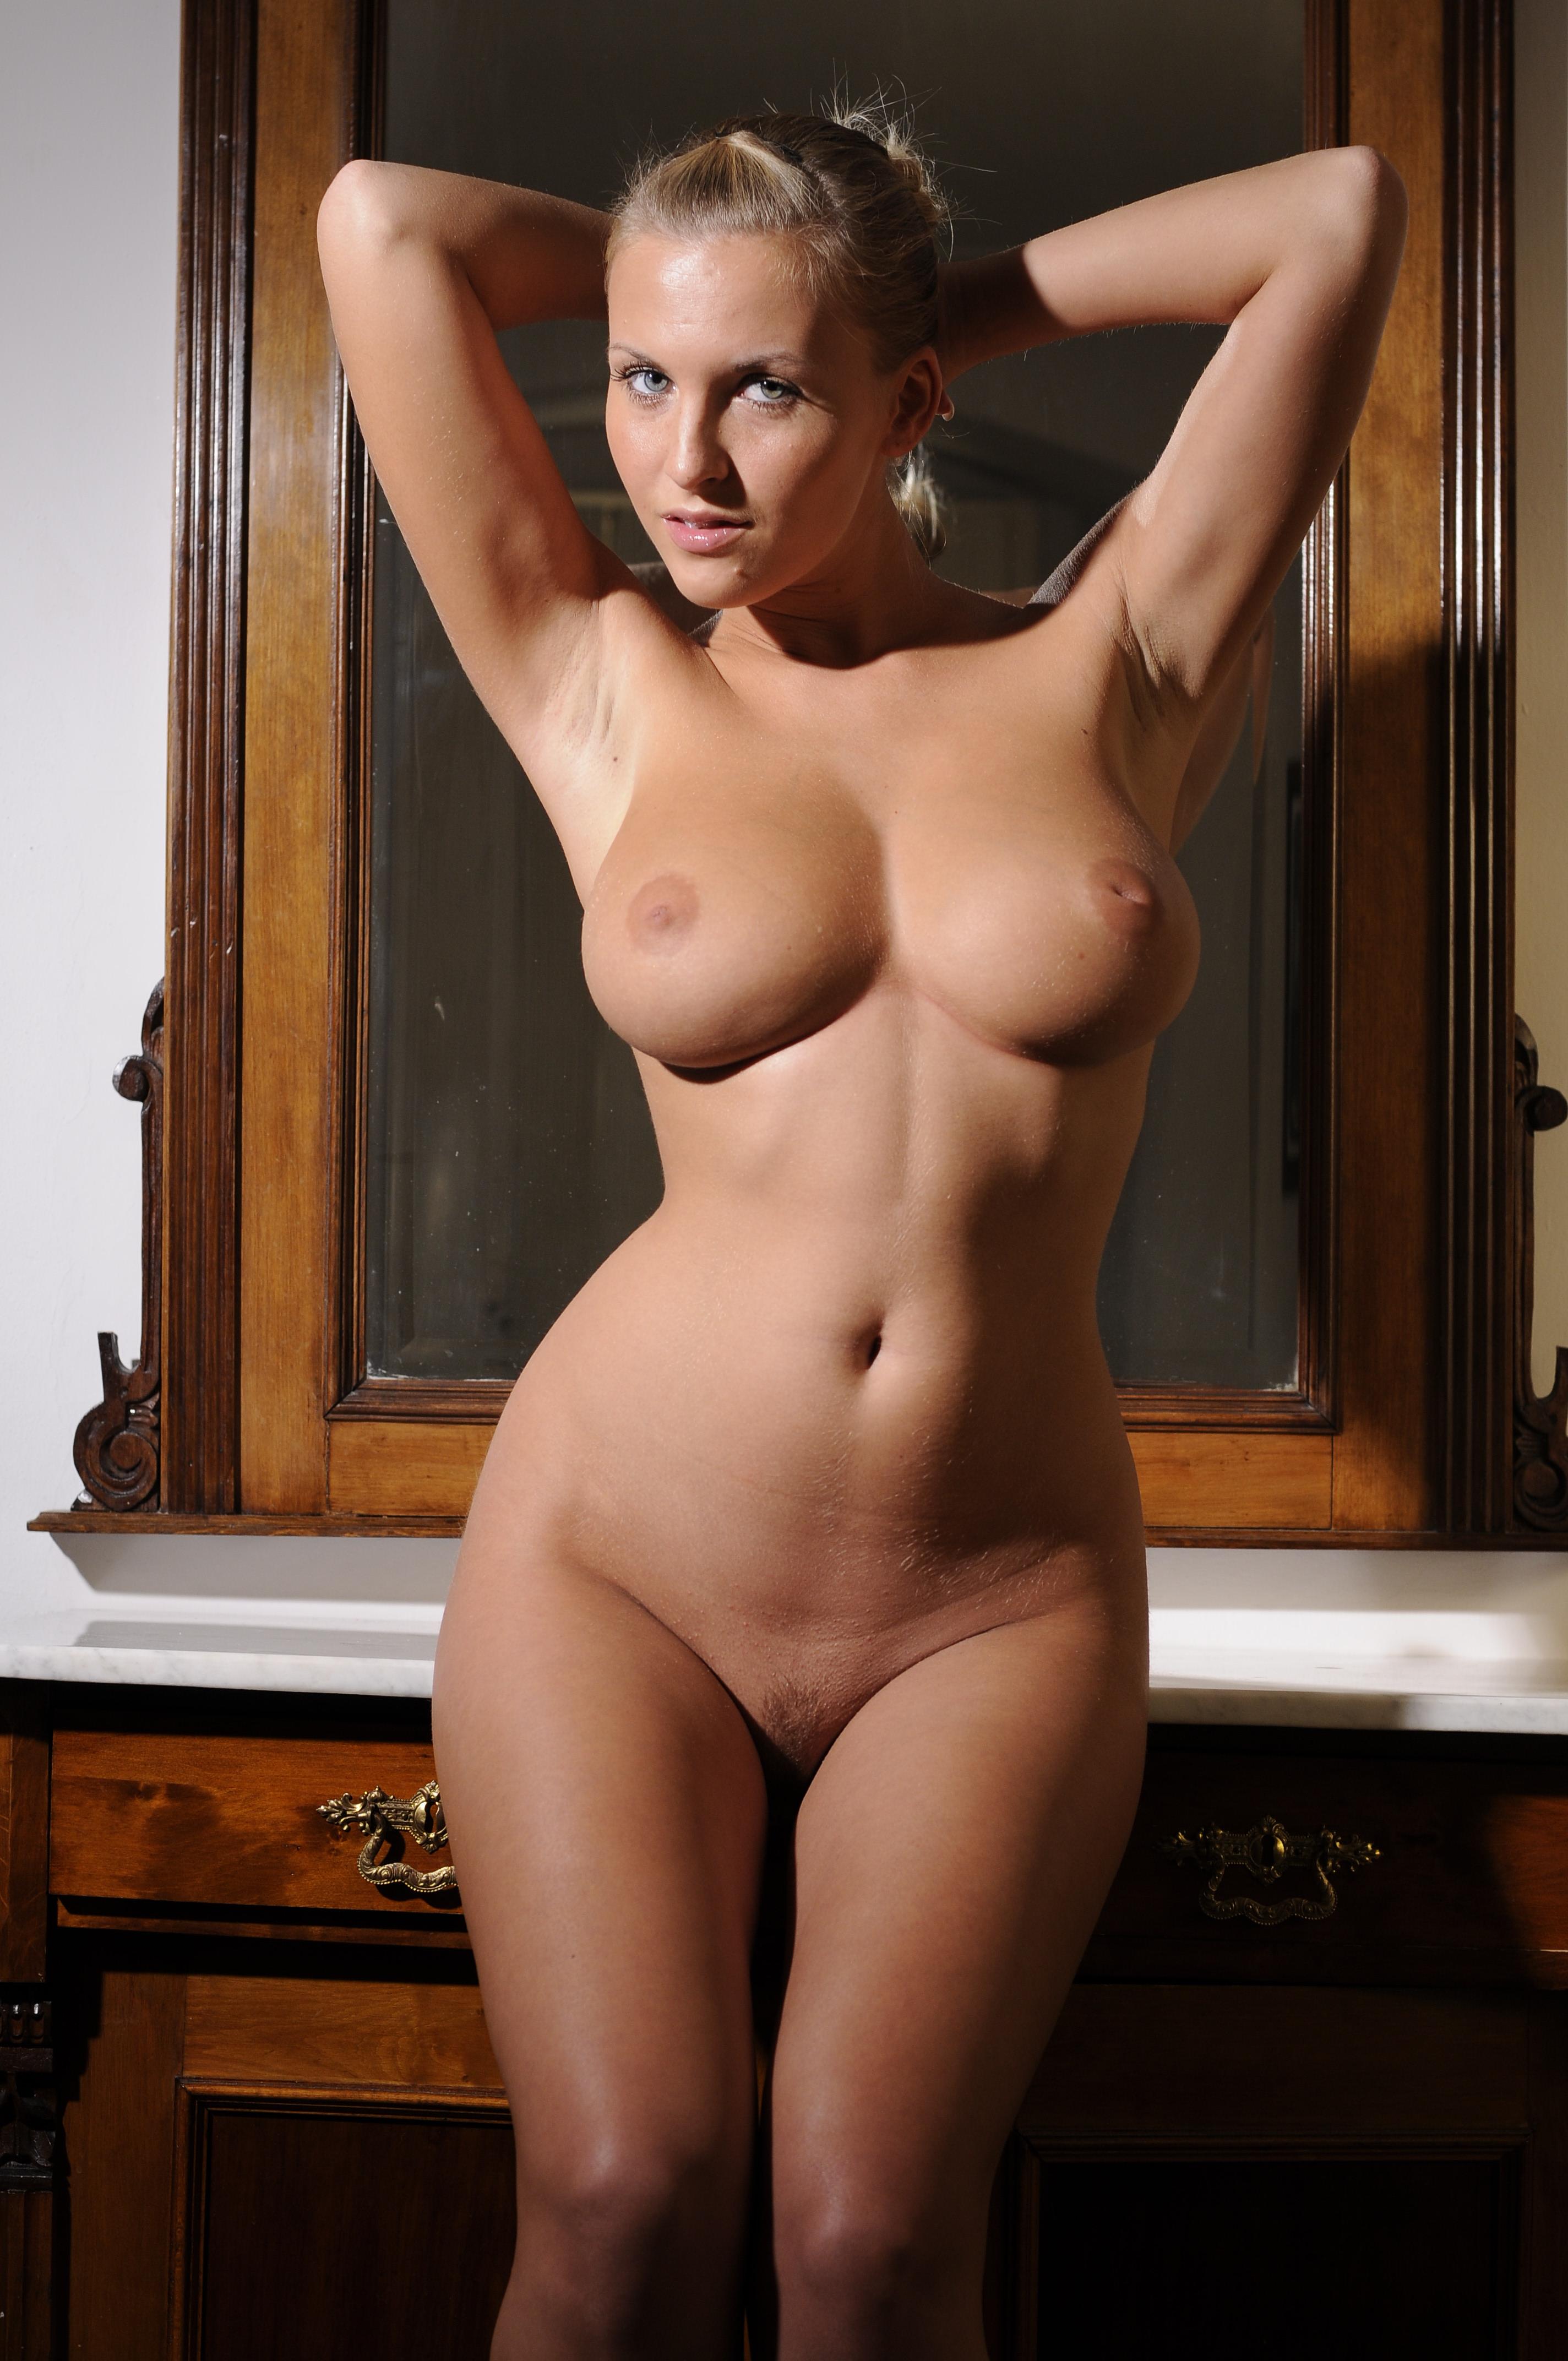 Women naked figure hourglass